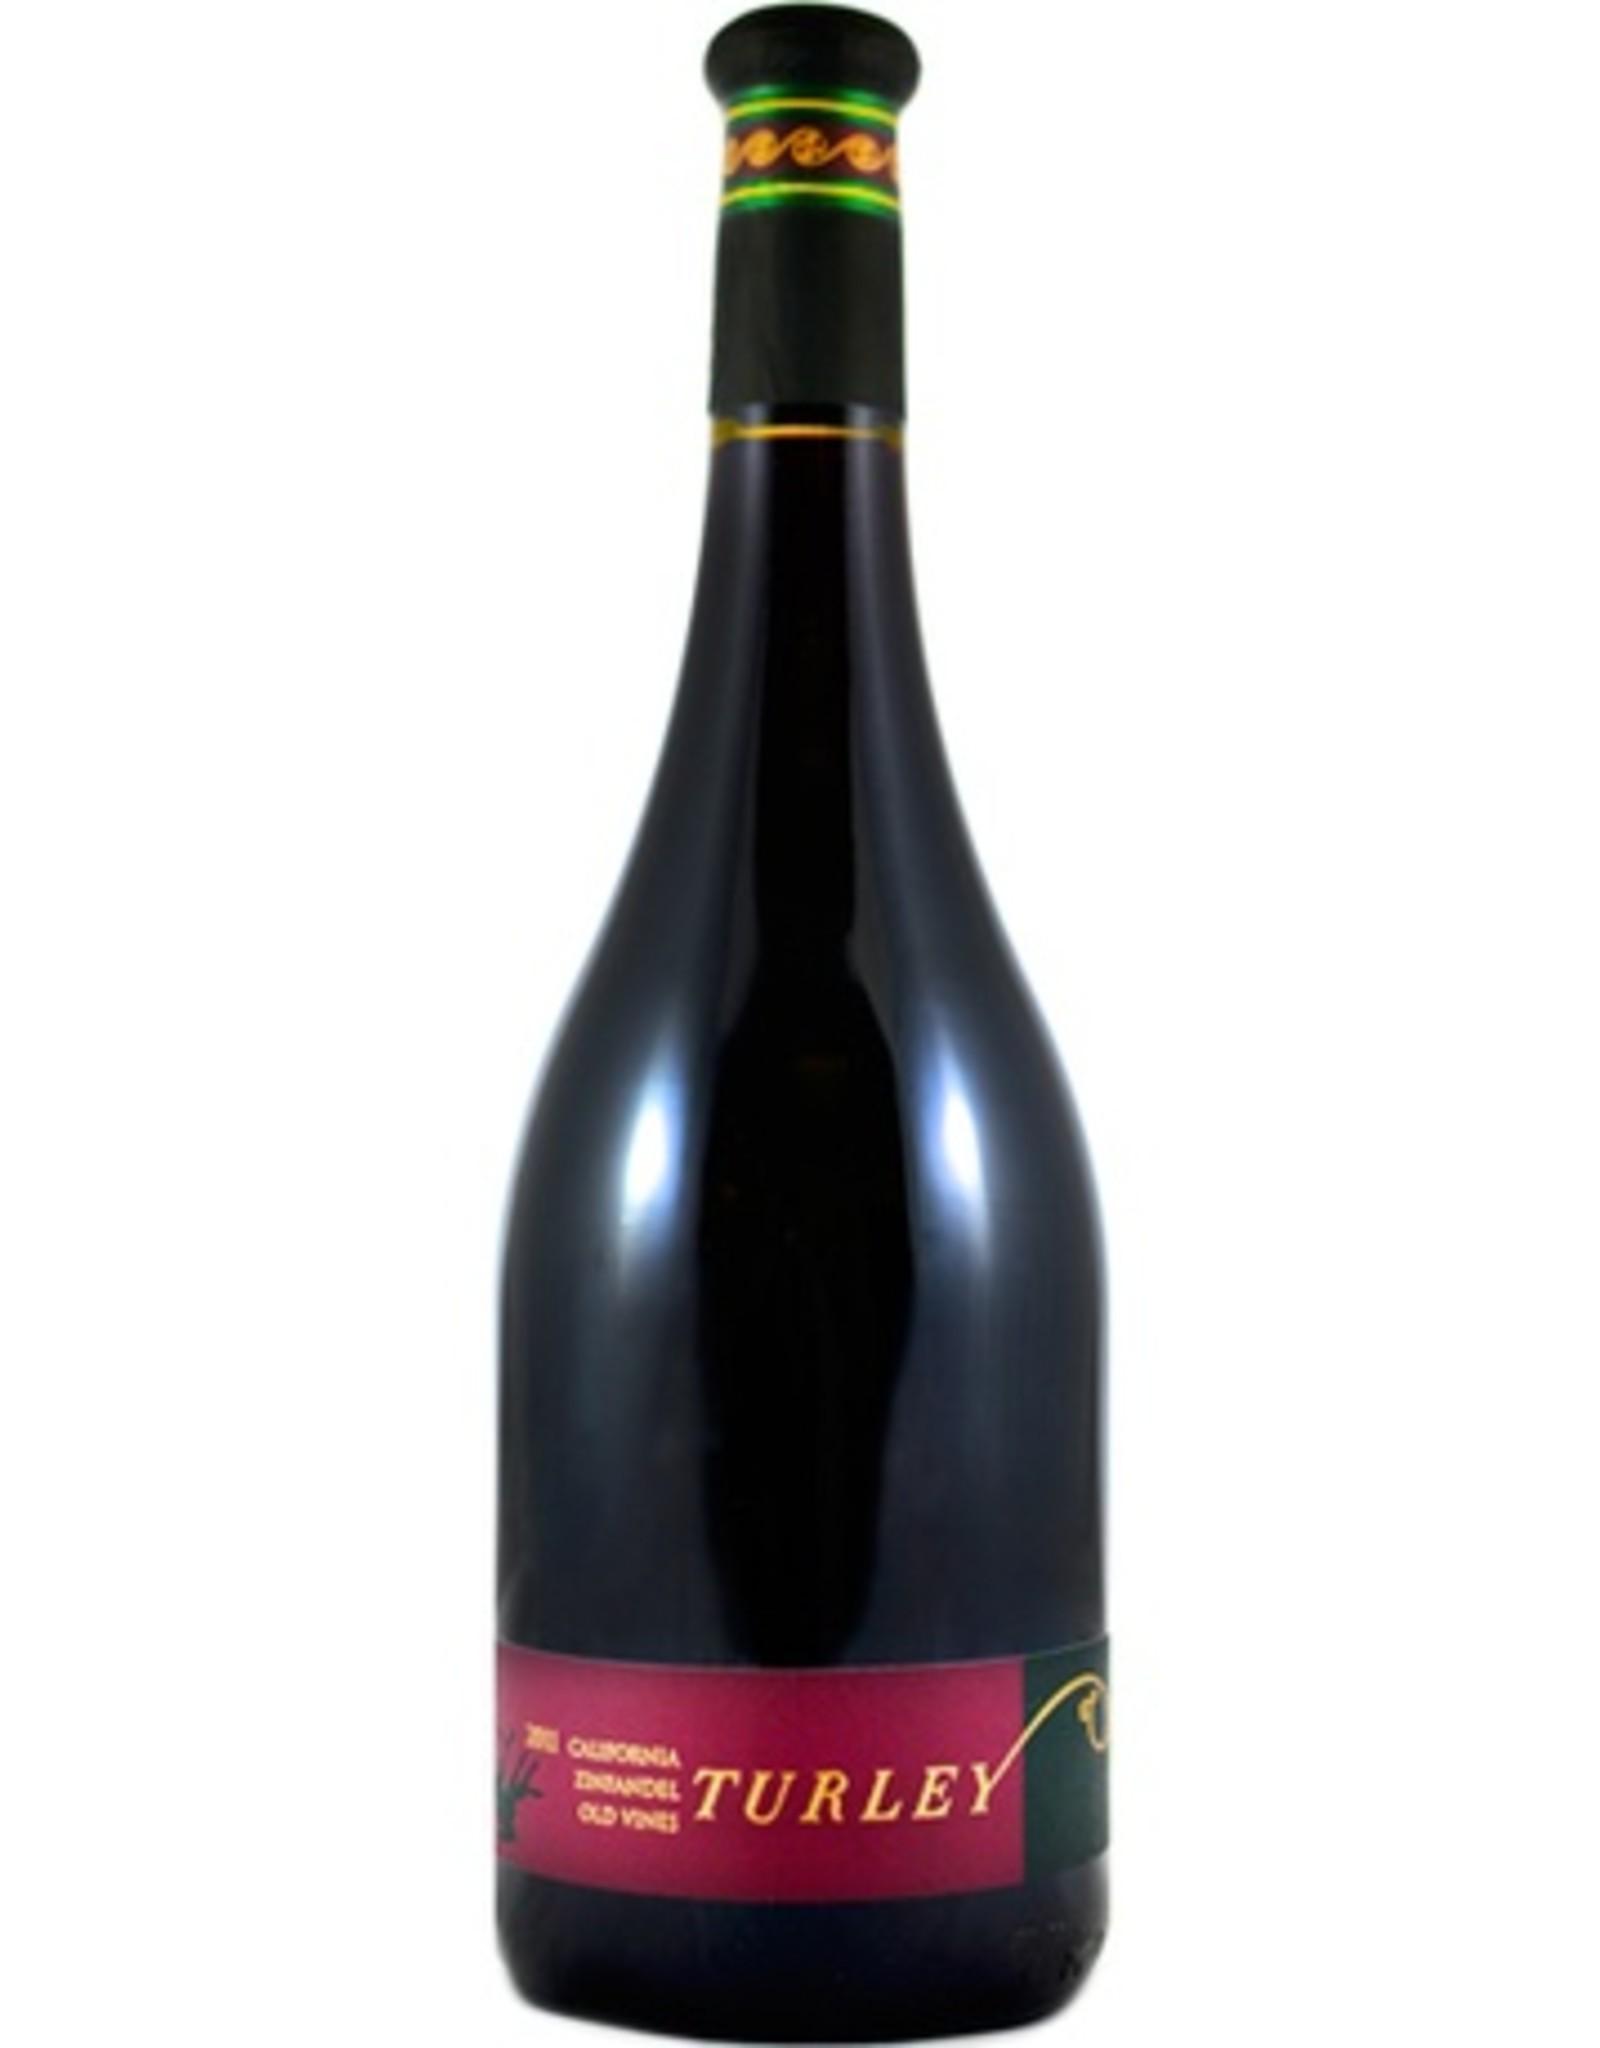 Red Wine 2017, Turley, Old Vine Zinfandel, Multi-regional Blend, Mutliple AVA, California, 15.5% Alc, CTnr, TW95